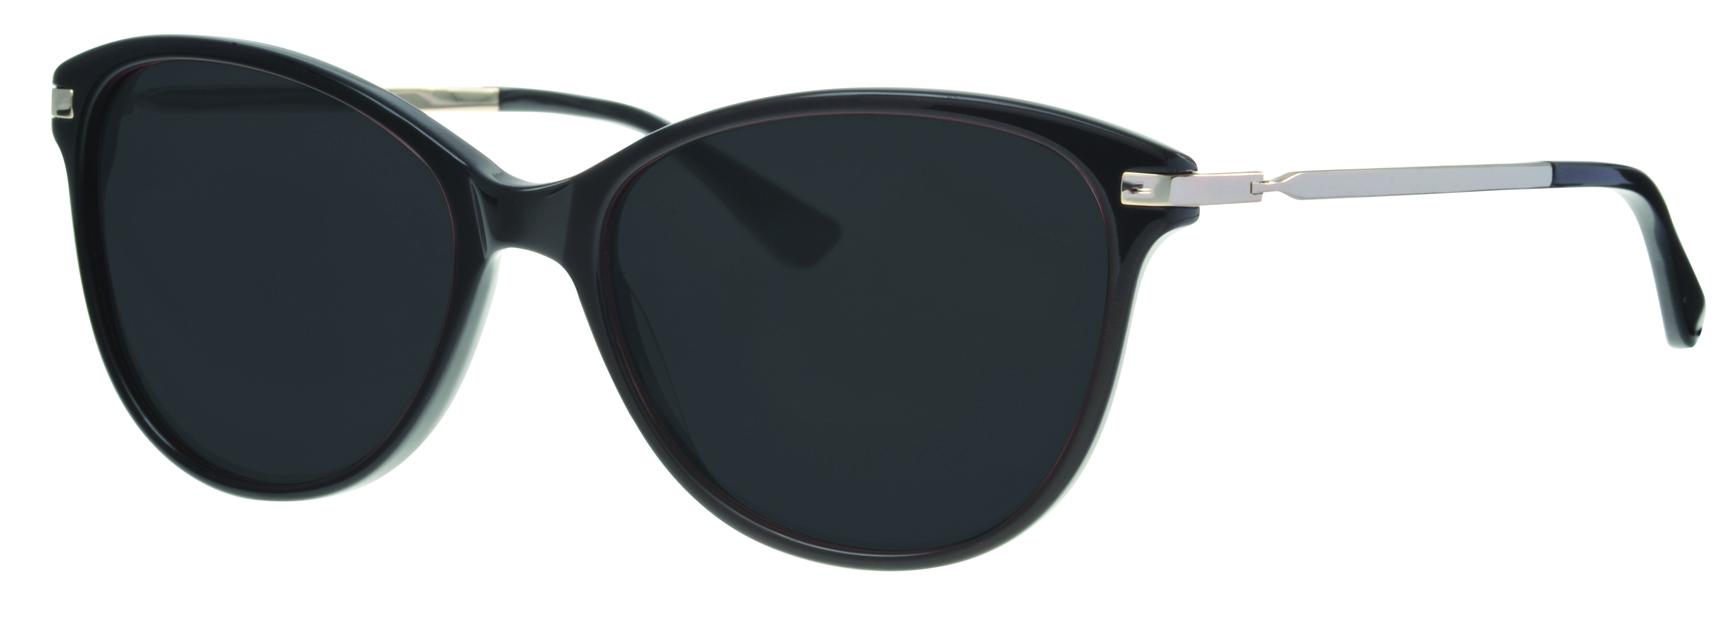 Ladies Elite Sunglasses with prescription fitted